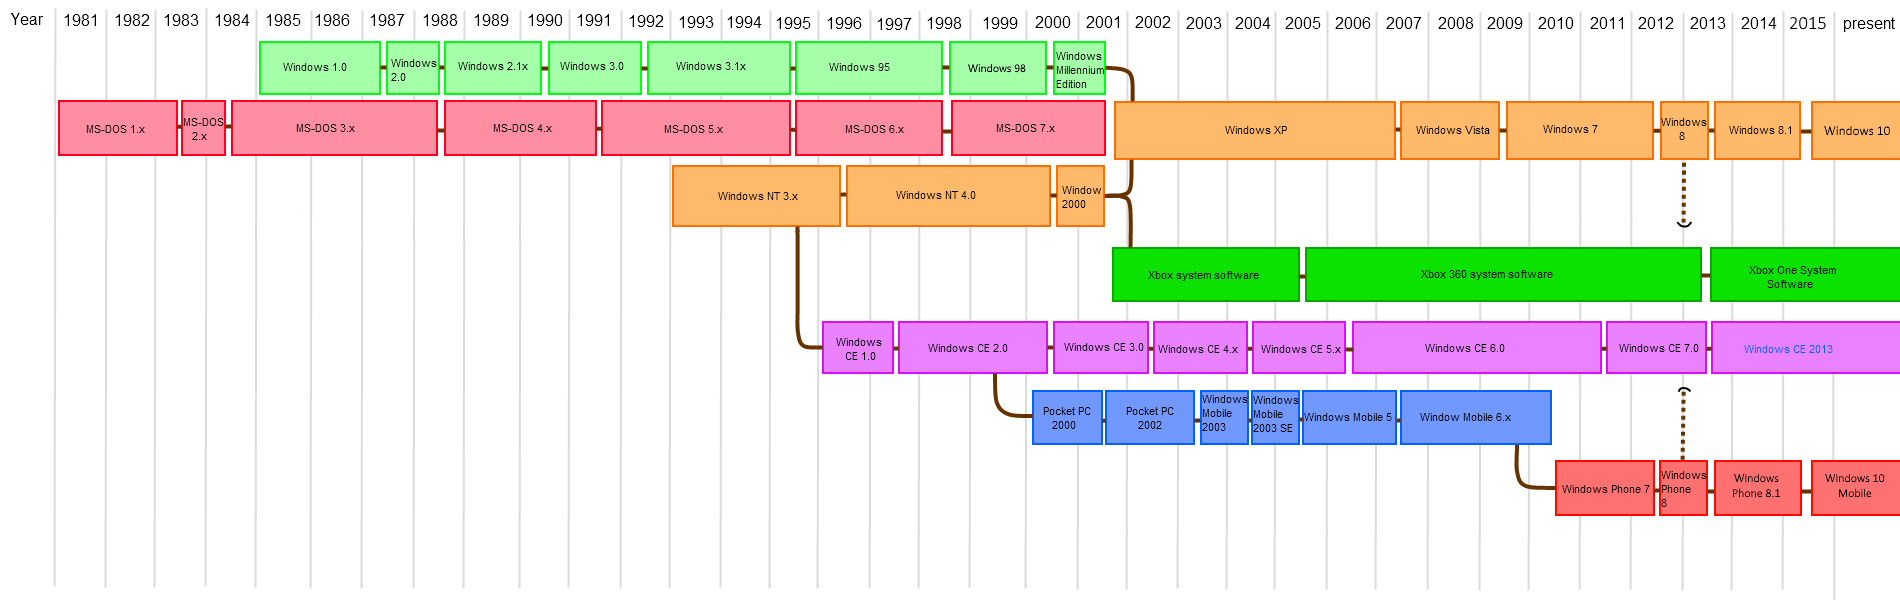 List of Microsoft Windows versions